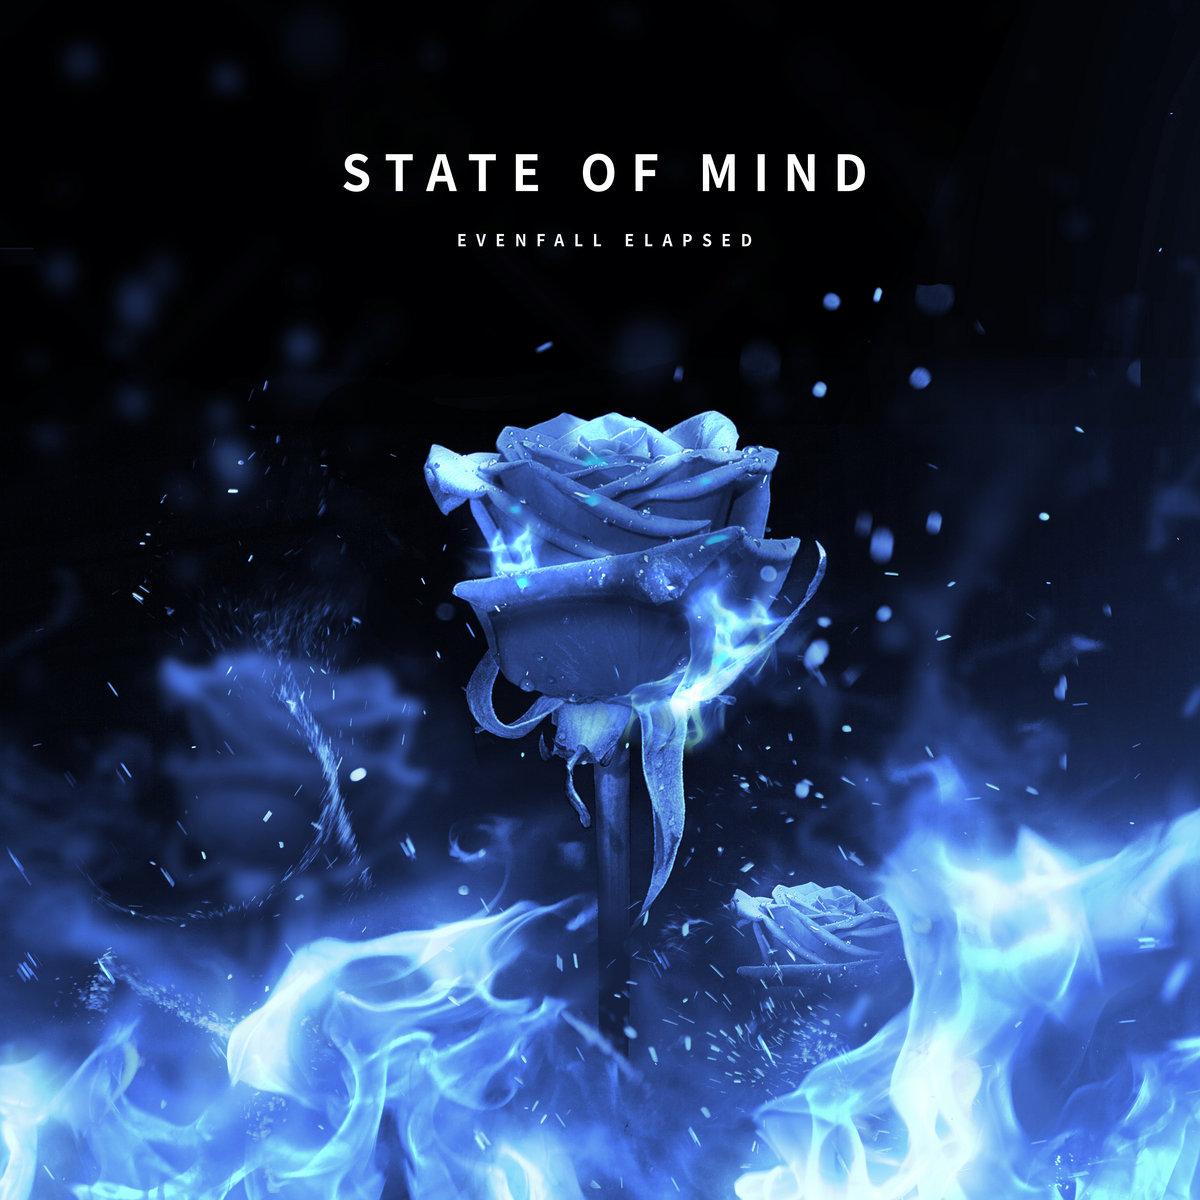 Evenfall Elapsed - State Of Mind [EP] (2019)